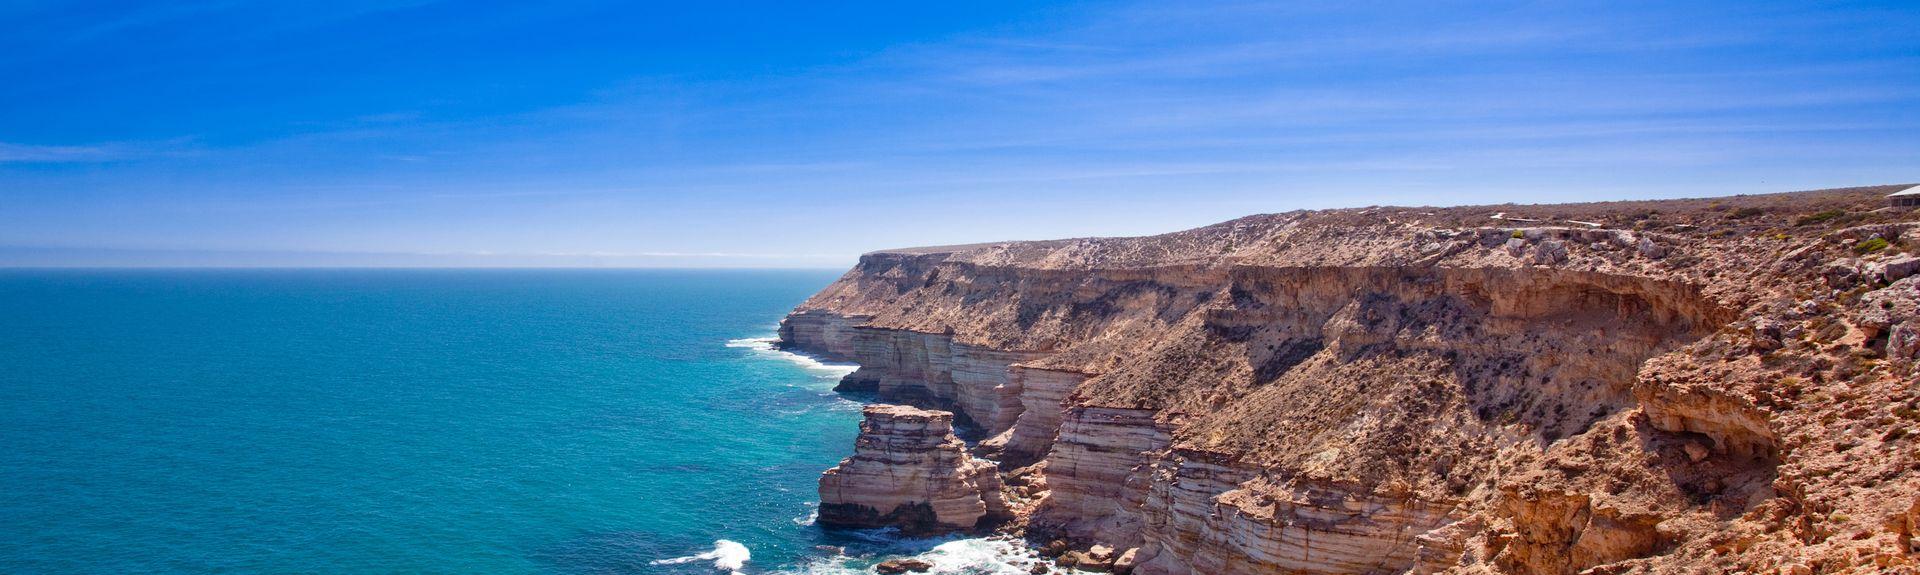 Westaustralien, Australien